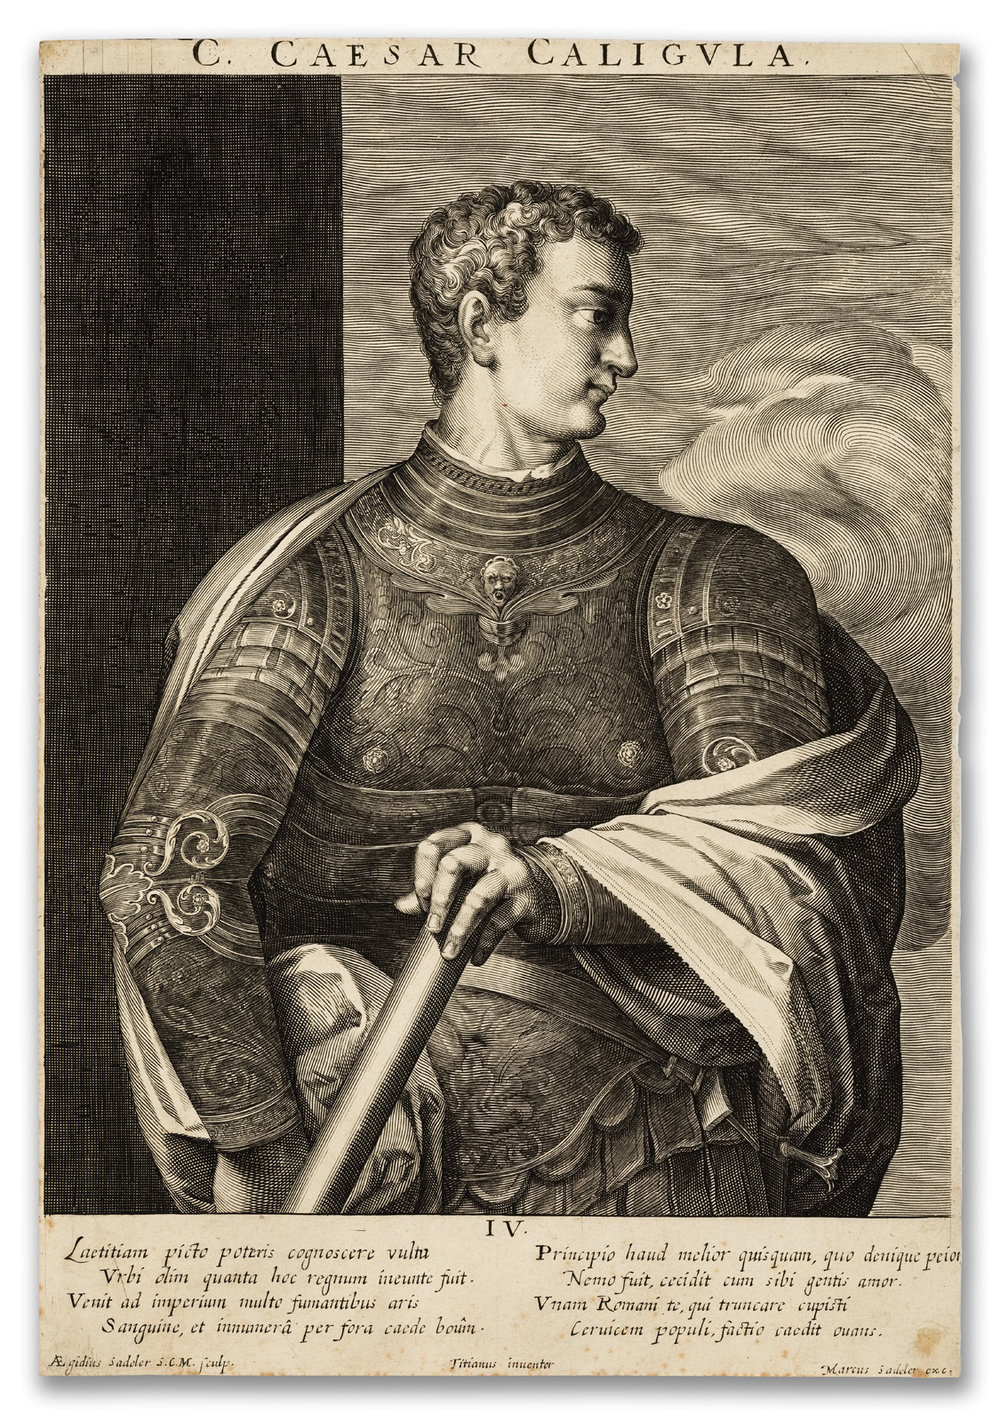 Aegidius Sadeler II (1570-1629), Portrait of Caesar Caligula (after Titian), c.1600.